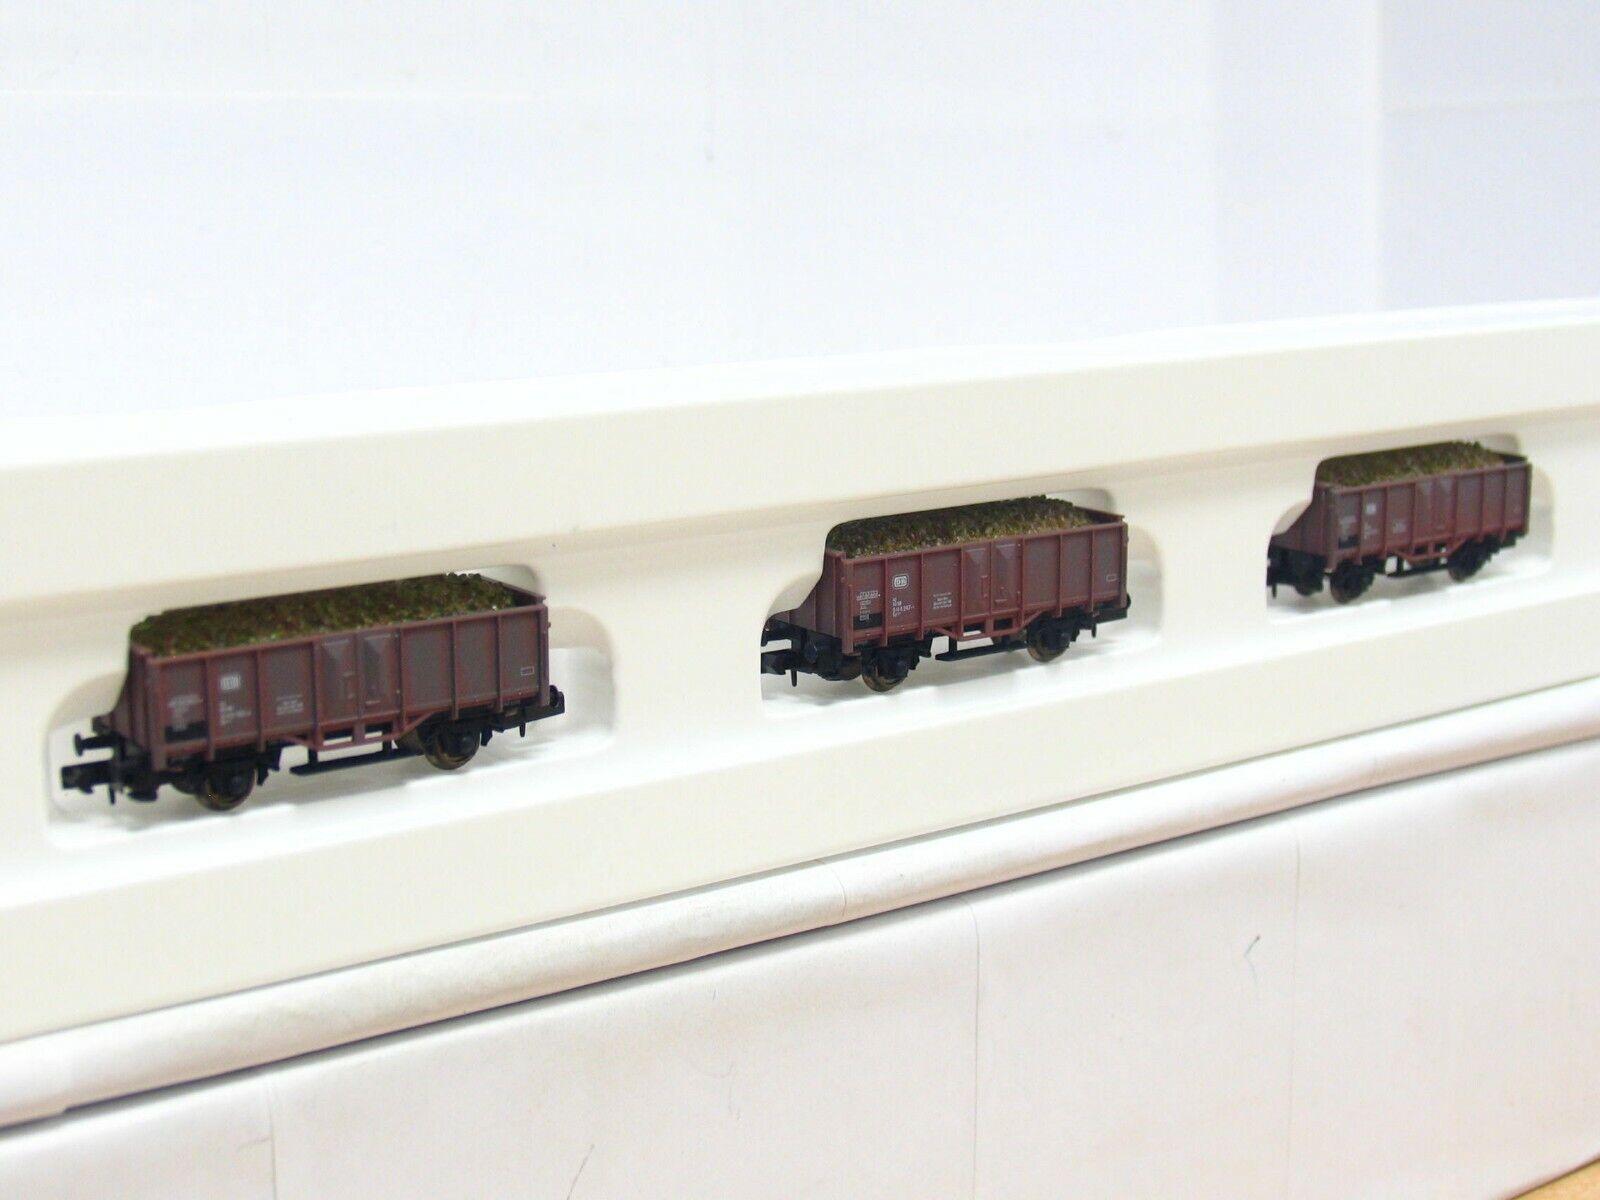 Arnold N 0244 3er Set beet wagon DB Boxed (RB8751)